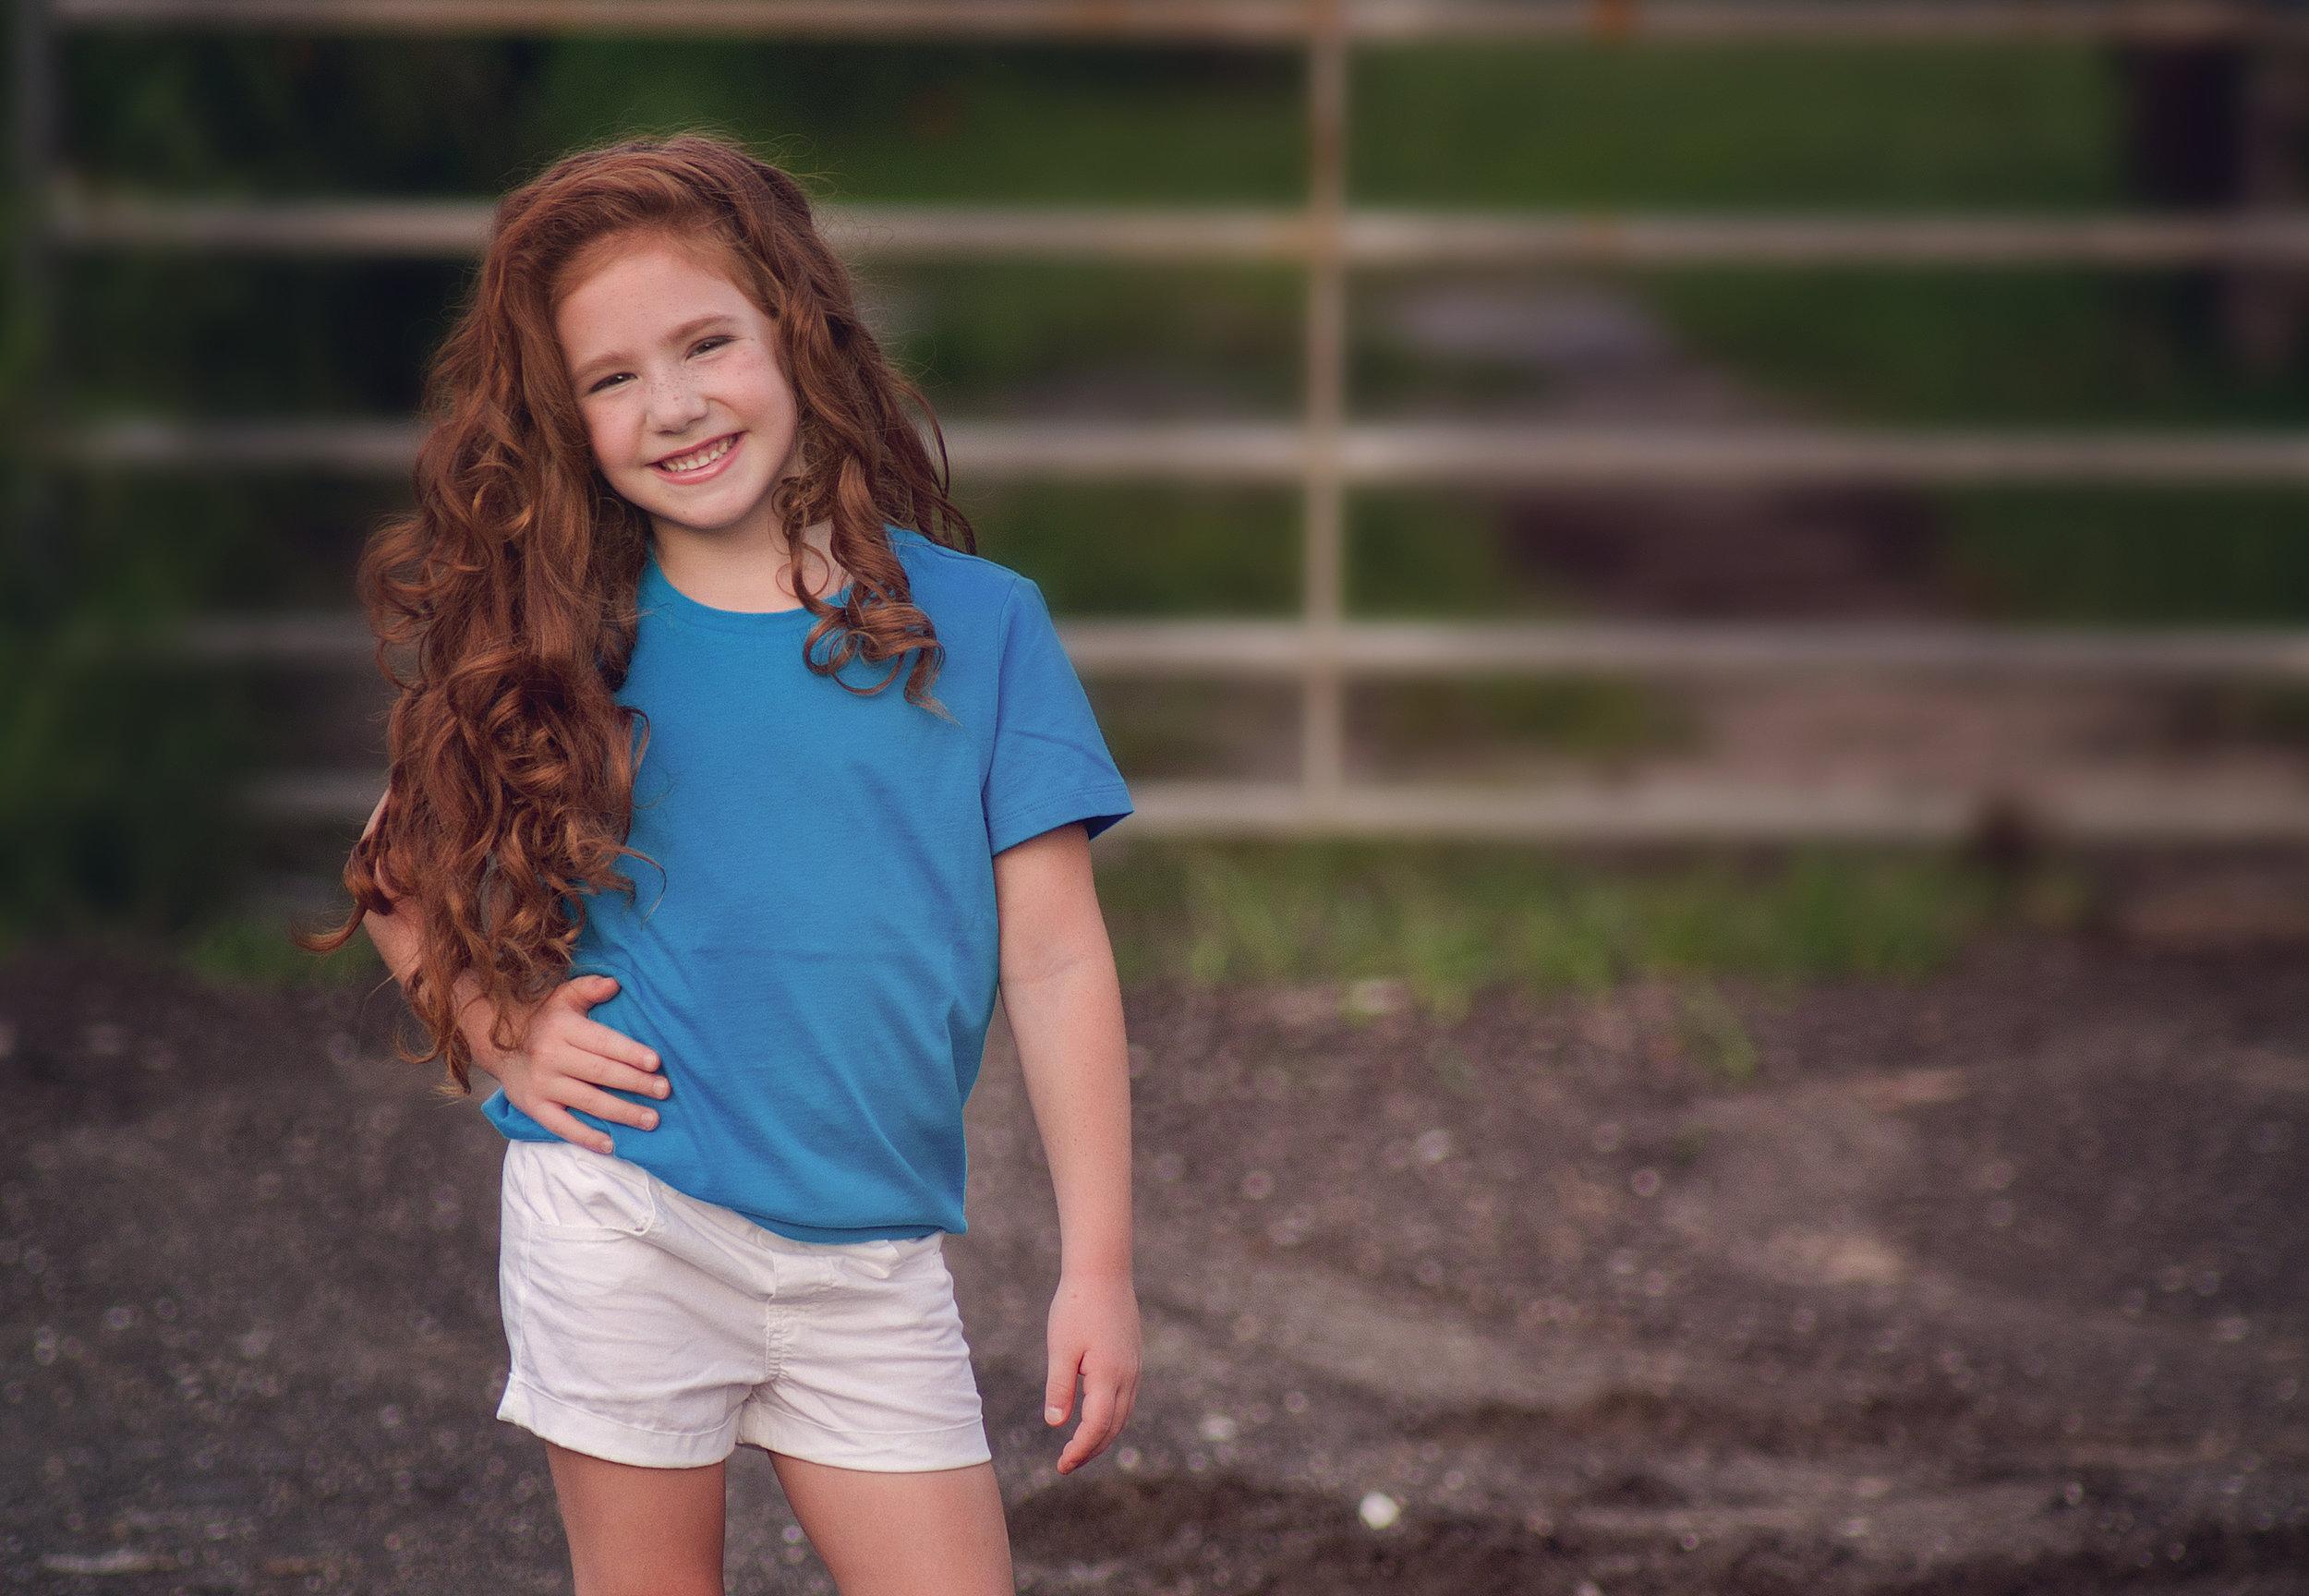 bradenton fl childrens photographer.jpg